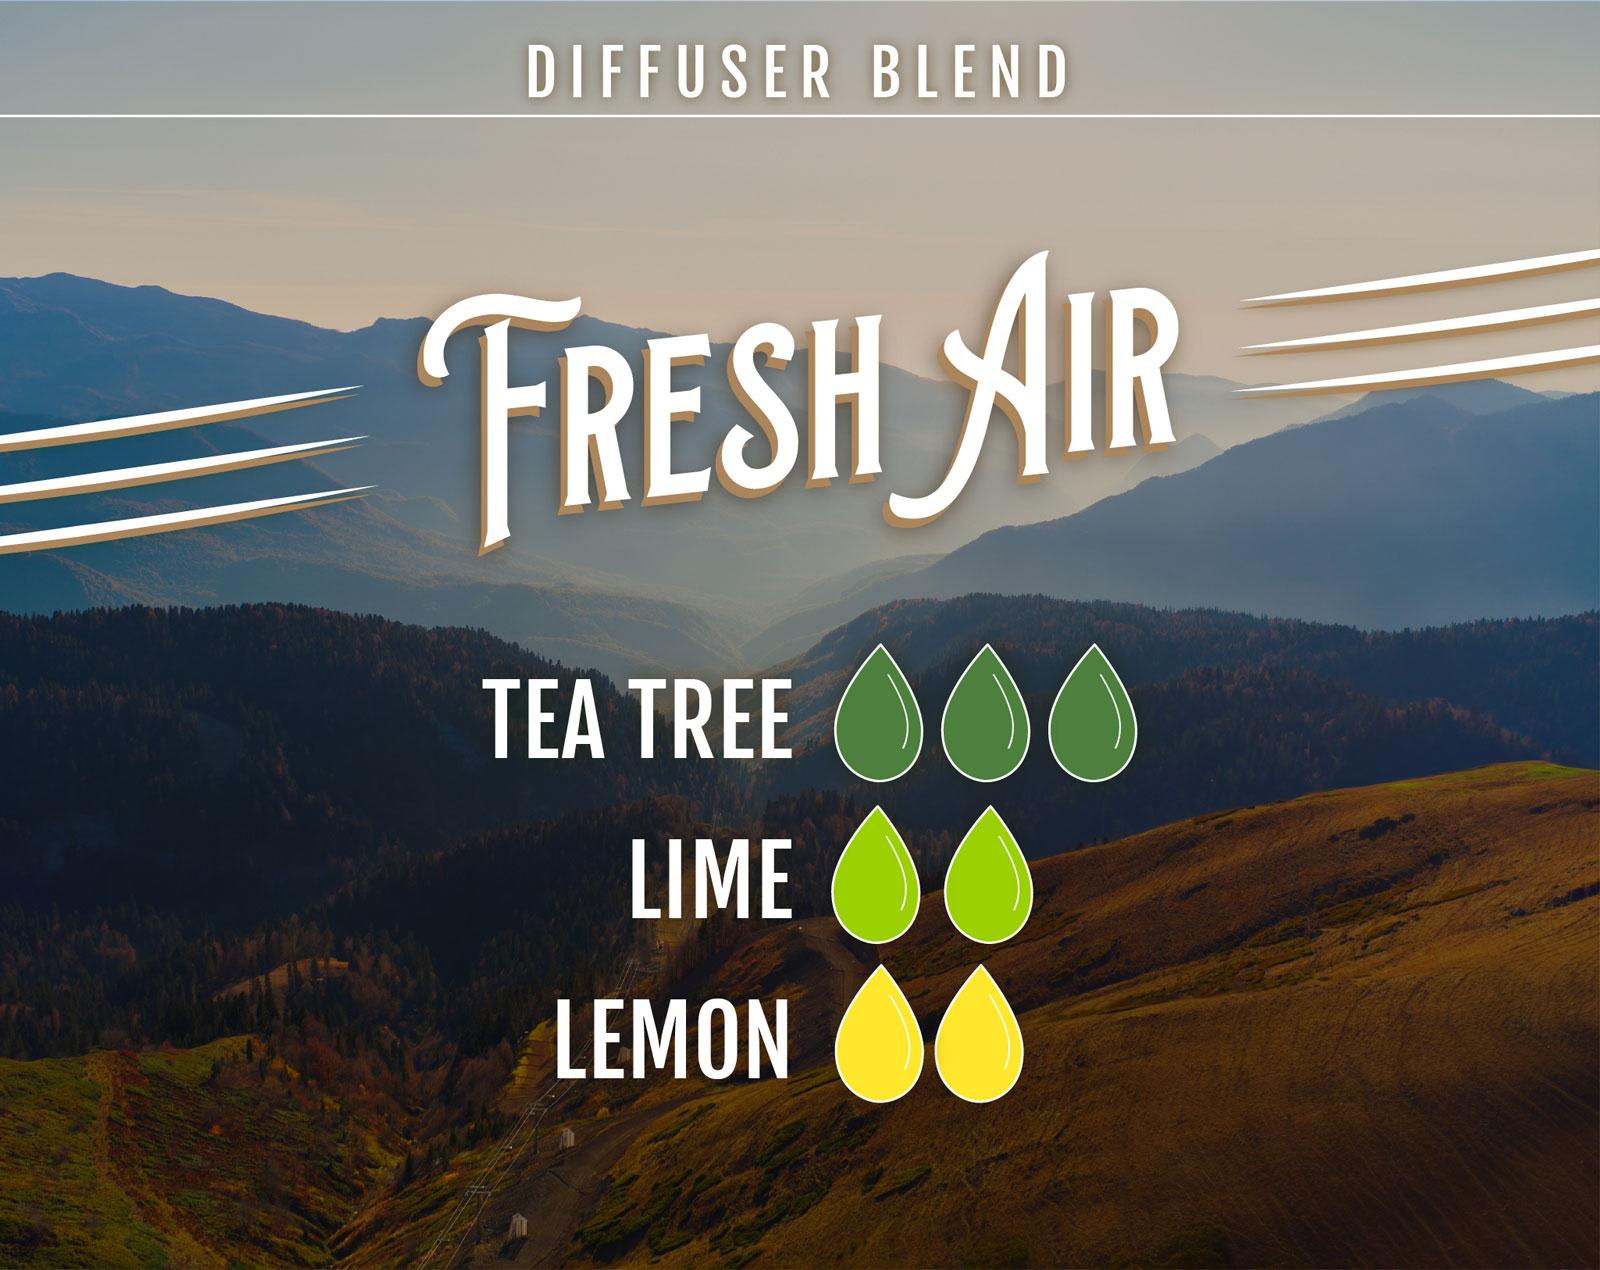 Tea Tree Essential Oil Diffuser Blend Fresh Air - 3 drops Tea Tree 2 drops Lime 2 drops Lemon